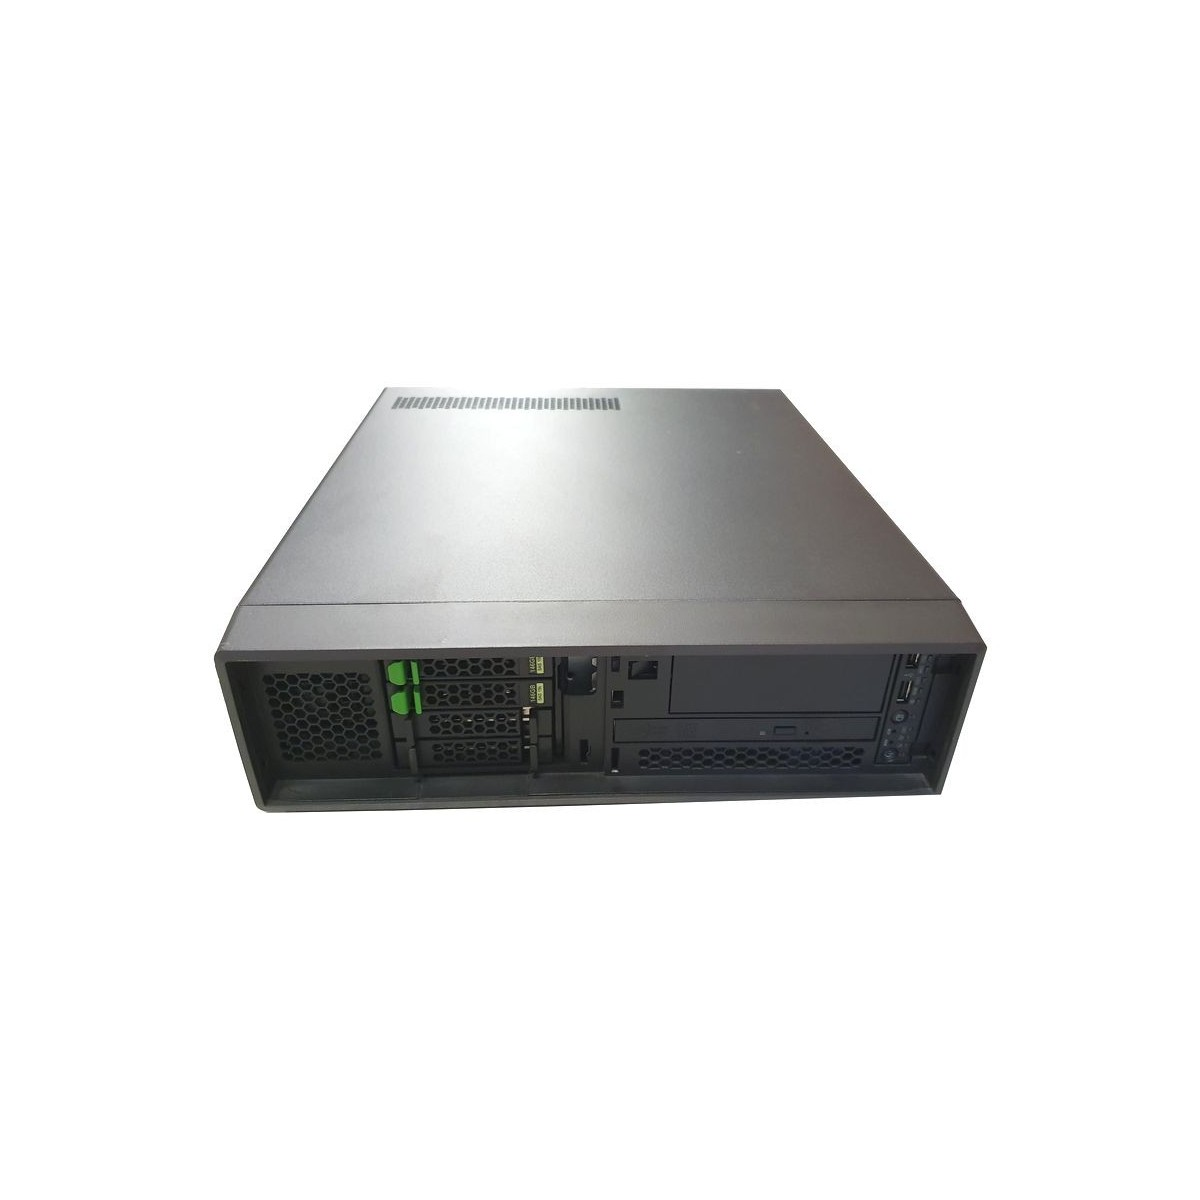 Radiator Heatsink do IBM x3650 M4 94Y6695